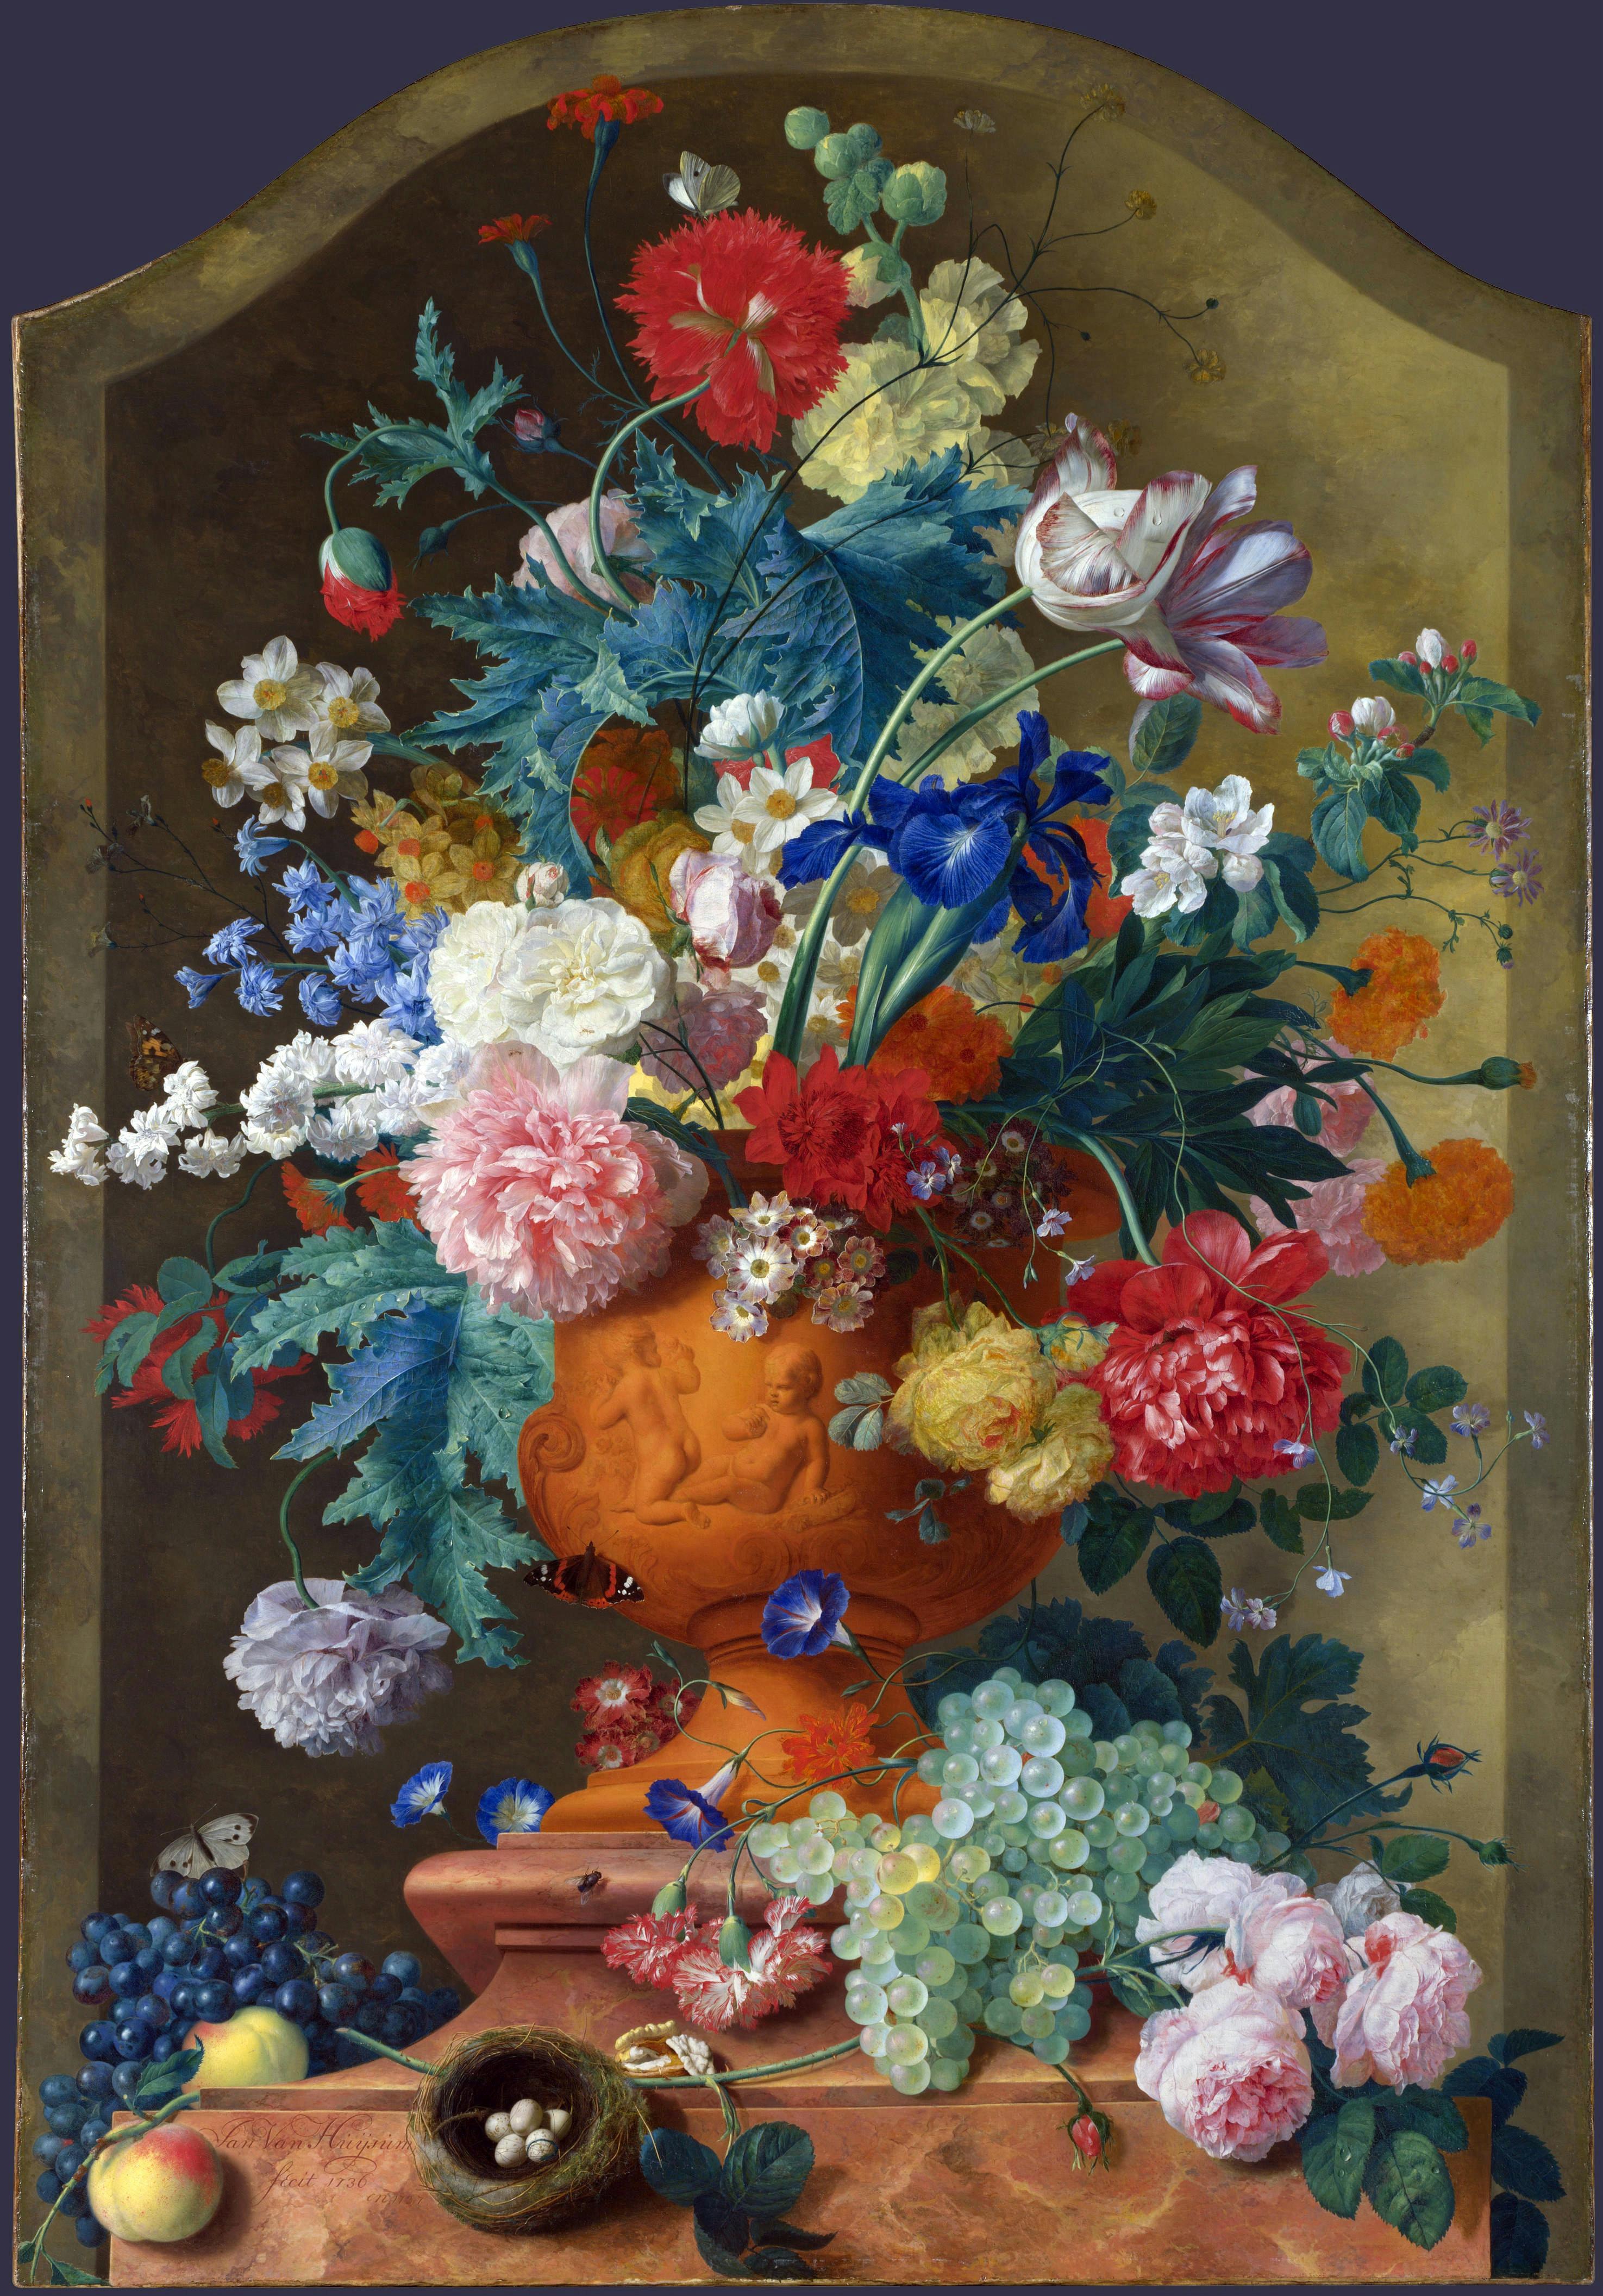 renoir vase of flowers of d–d¸d²d¾dd¸nnŒ dšddnnd¸dod d¶dd½n€d ddn'nŽn€d¼d¾n inside jan van huysum flowers in a terracotta vase